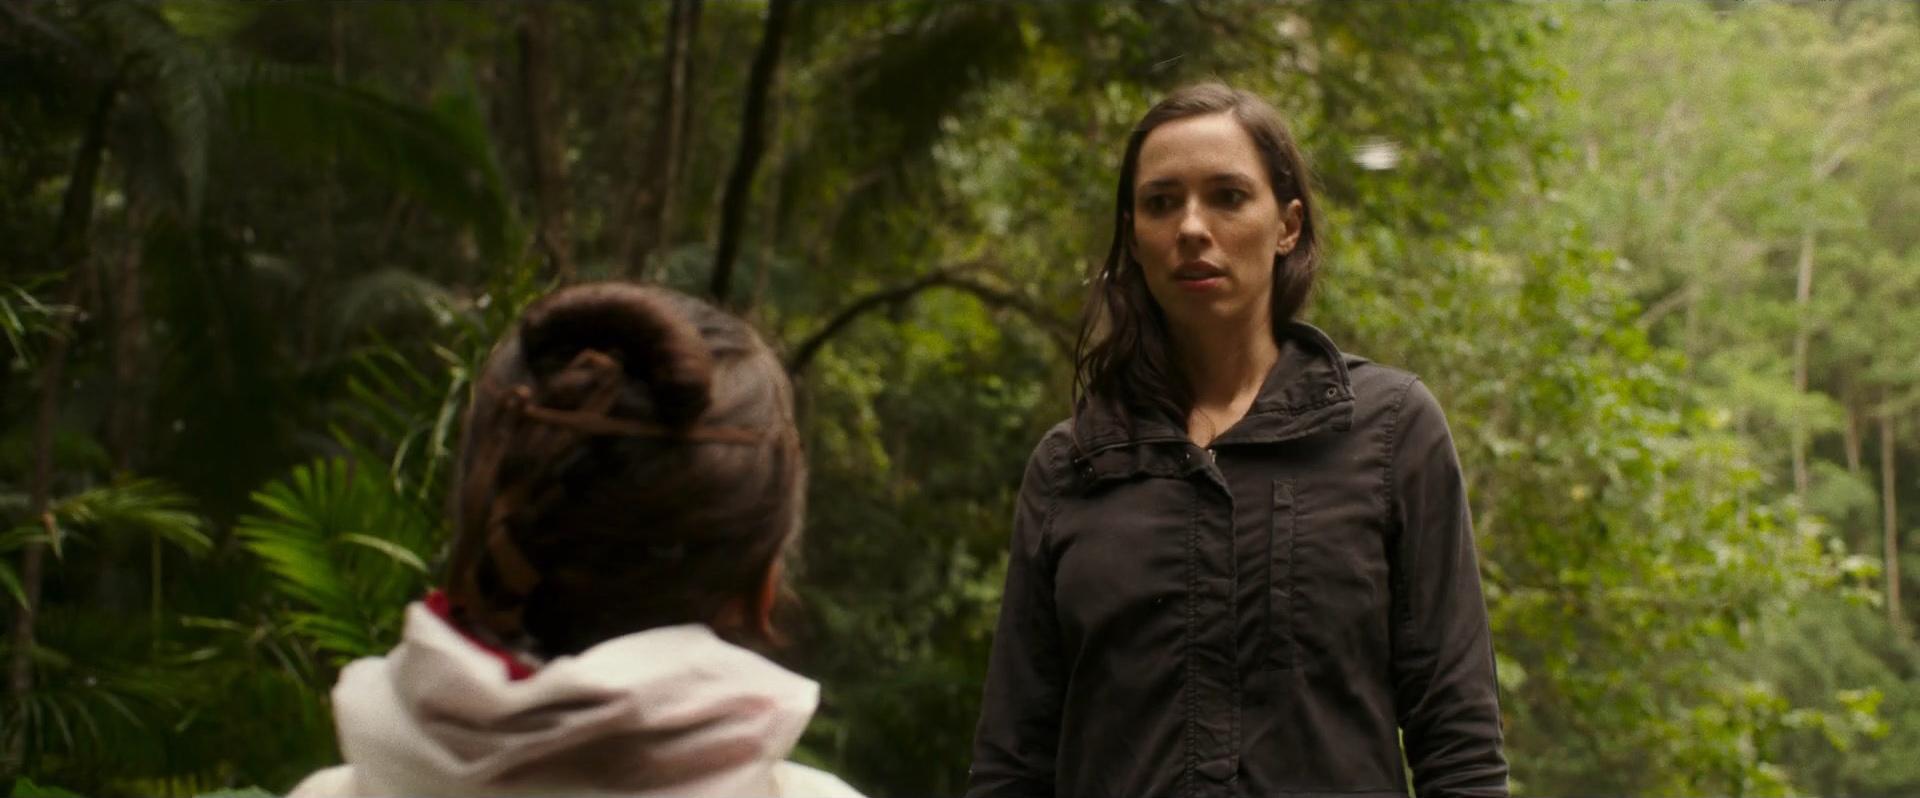 Godzilla vs Kong Trailer Still 16 - Rebecca Hall Jungle